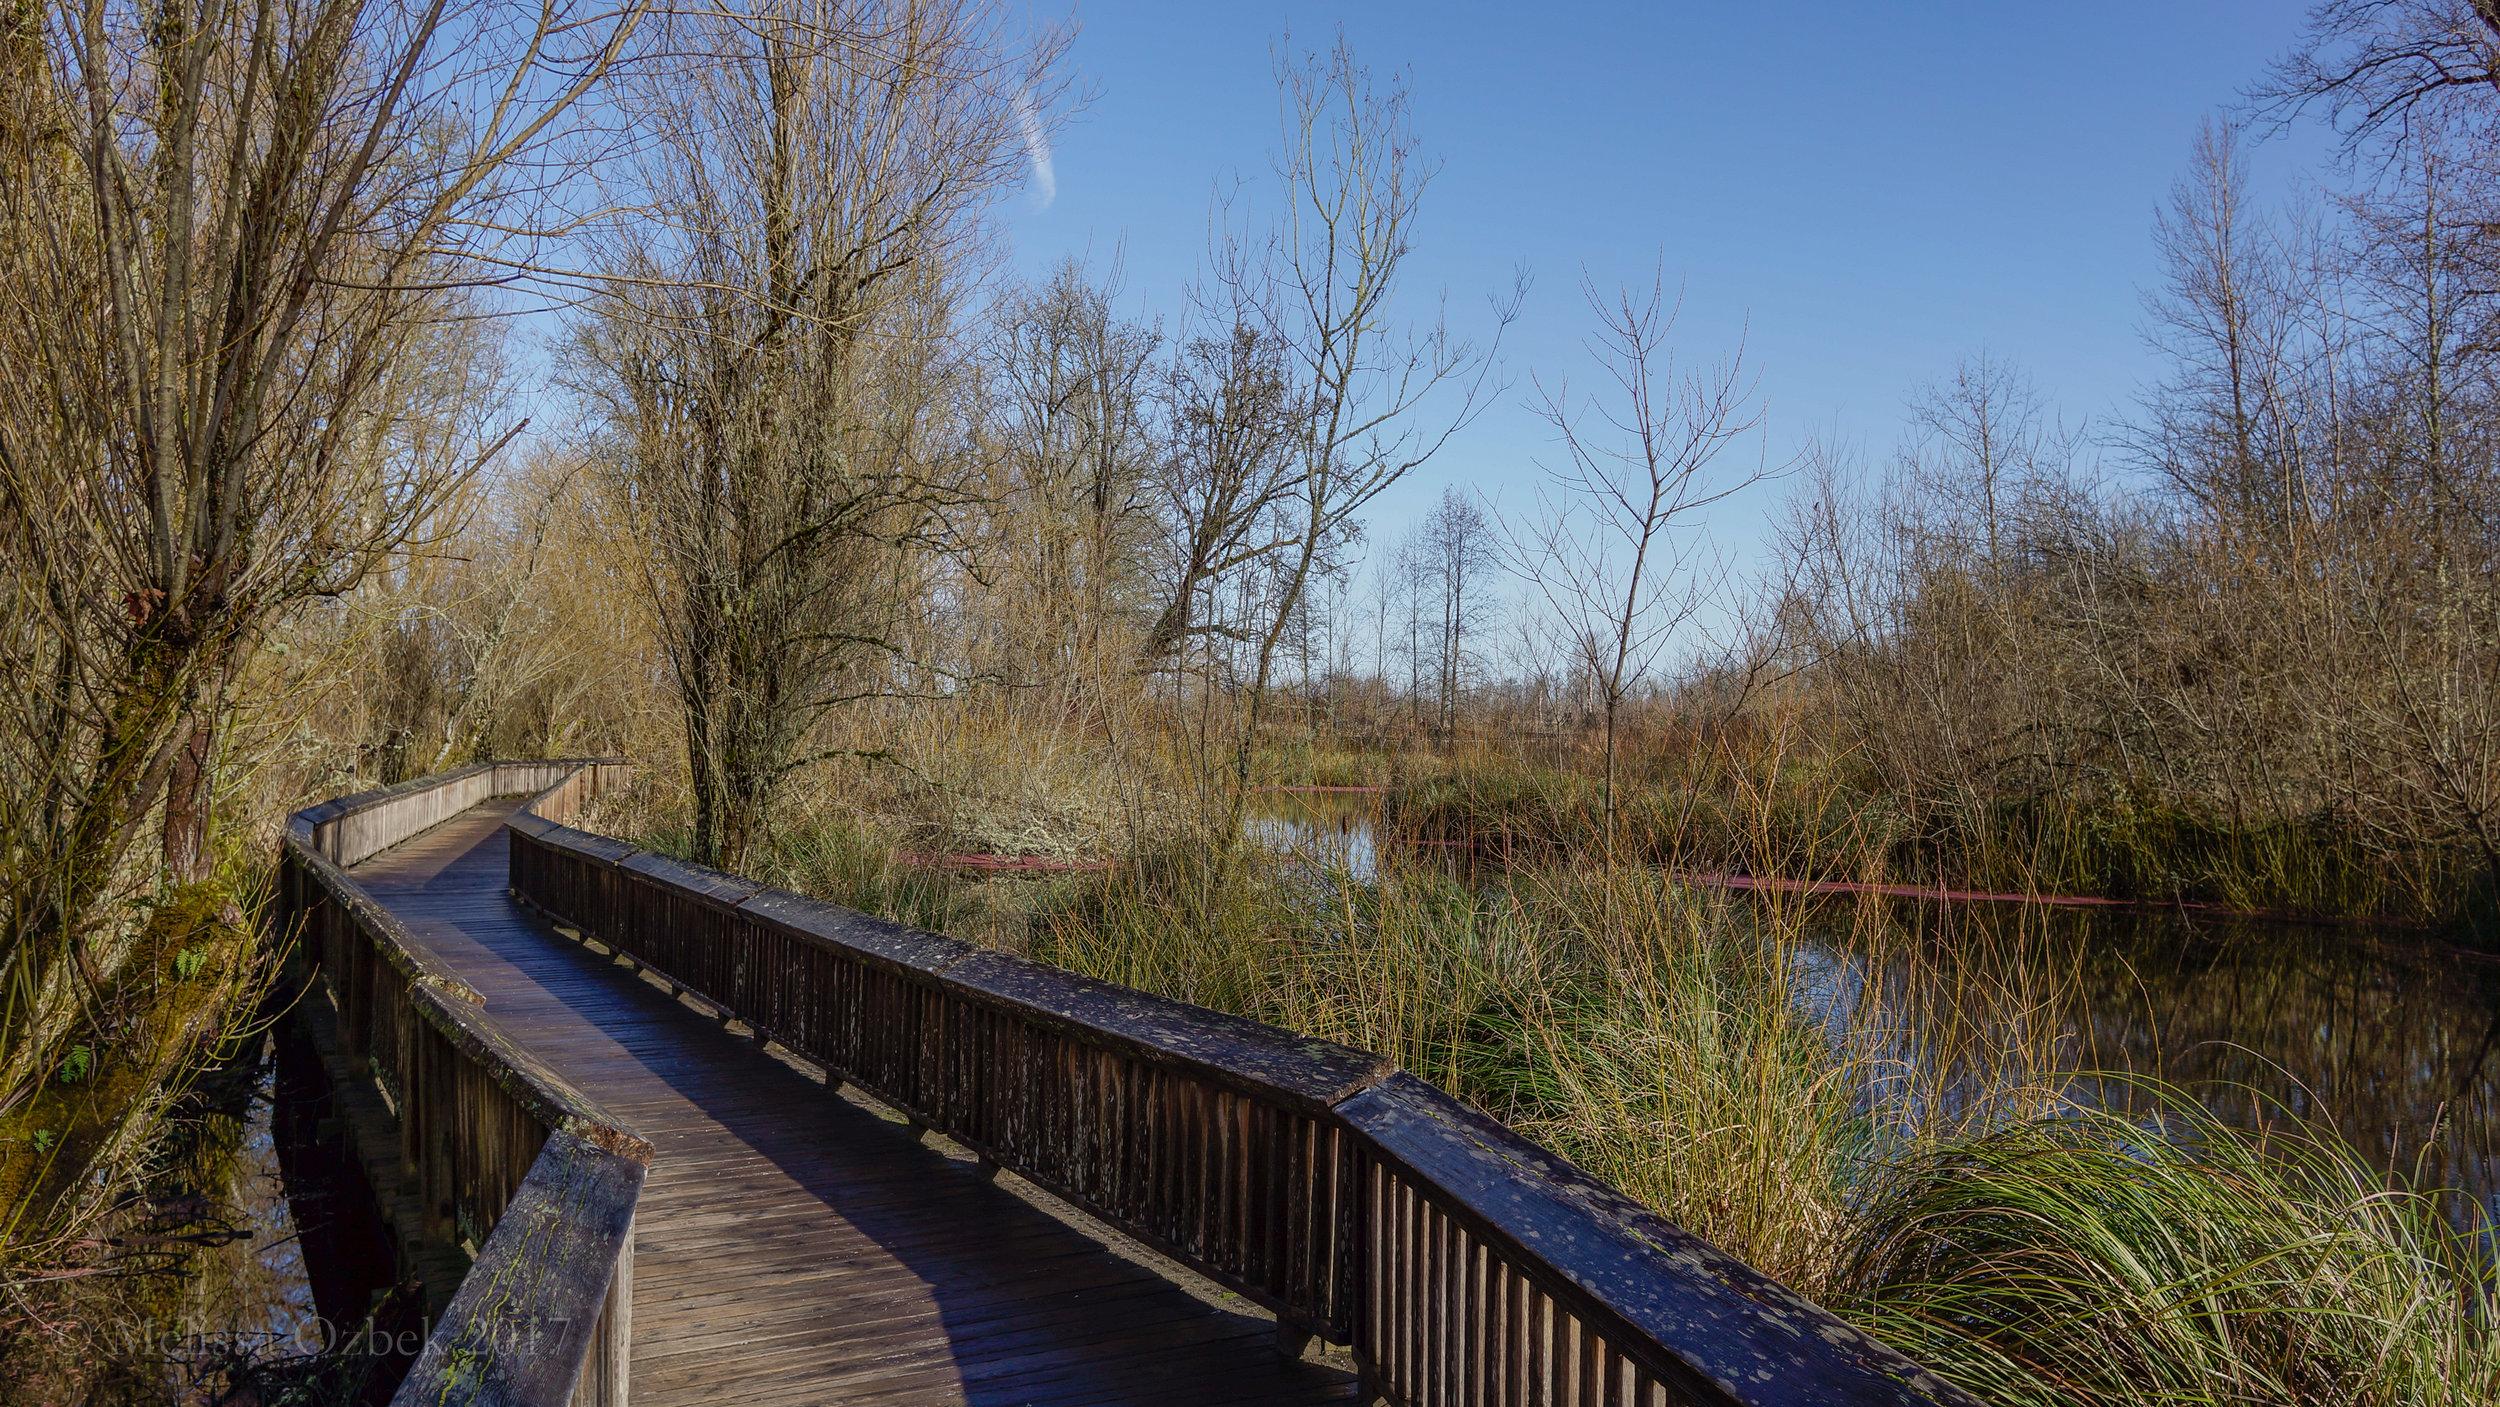 18. Nisqually Estuary Boardwalk Trail